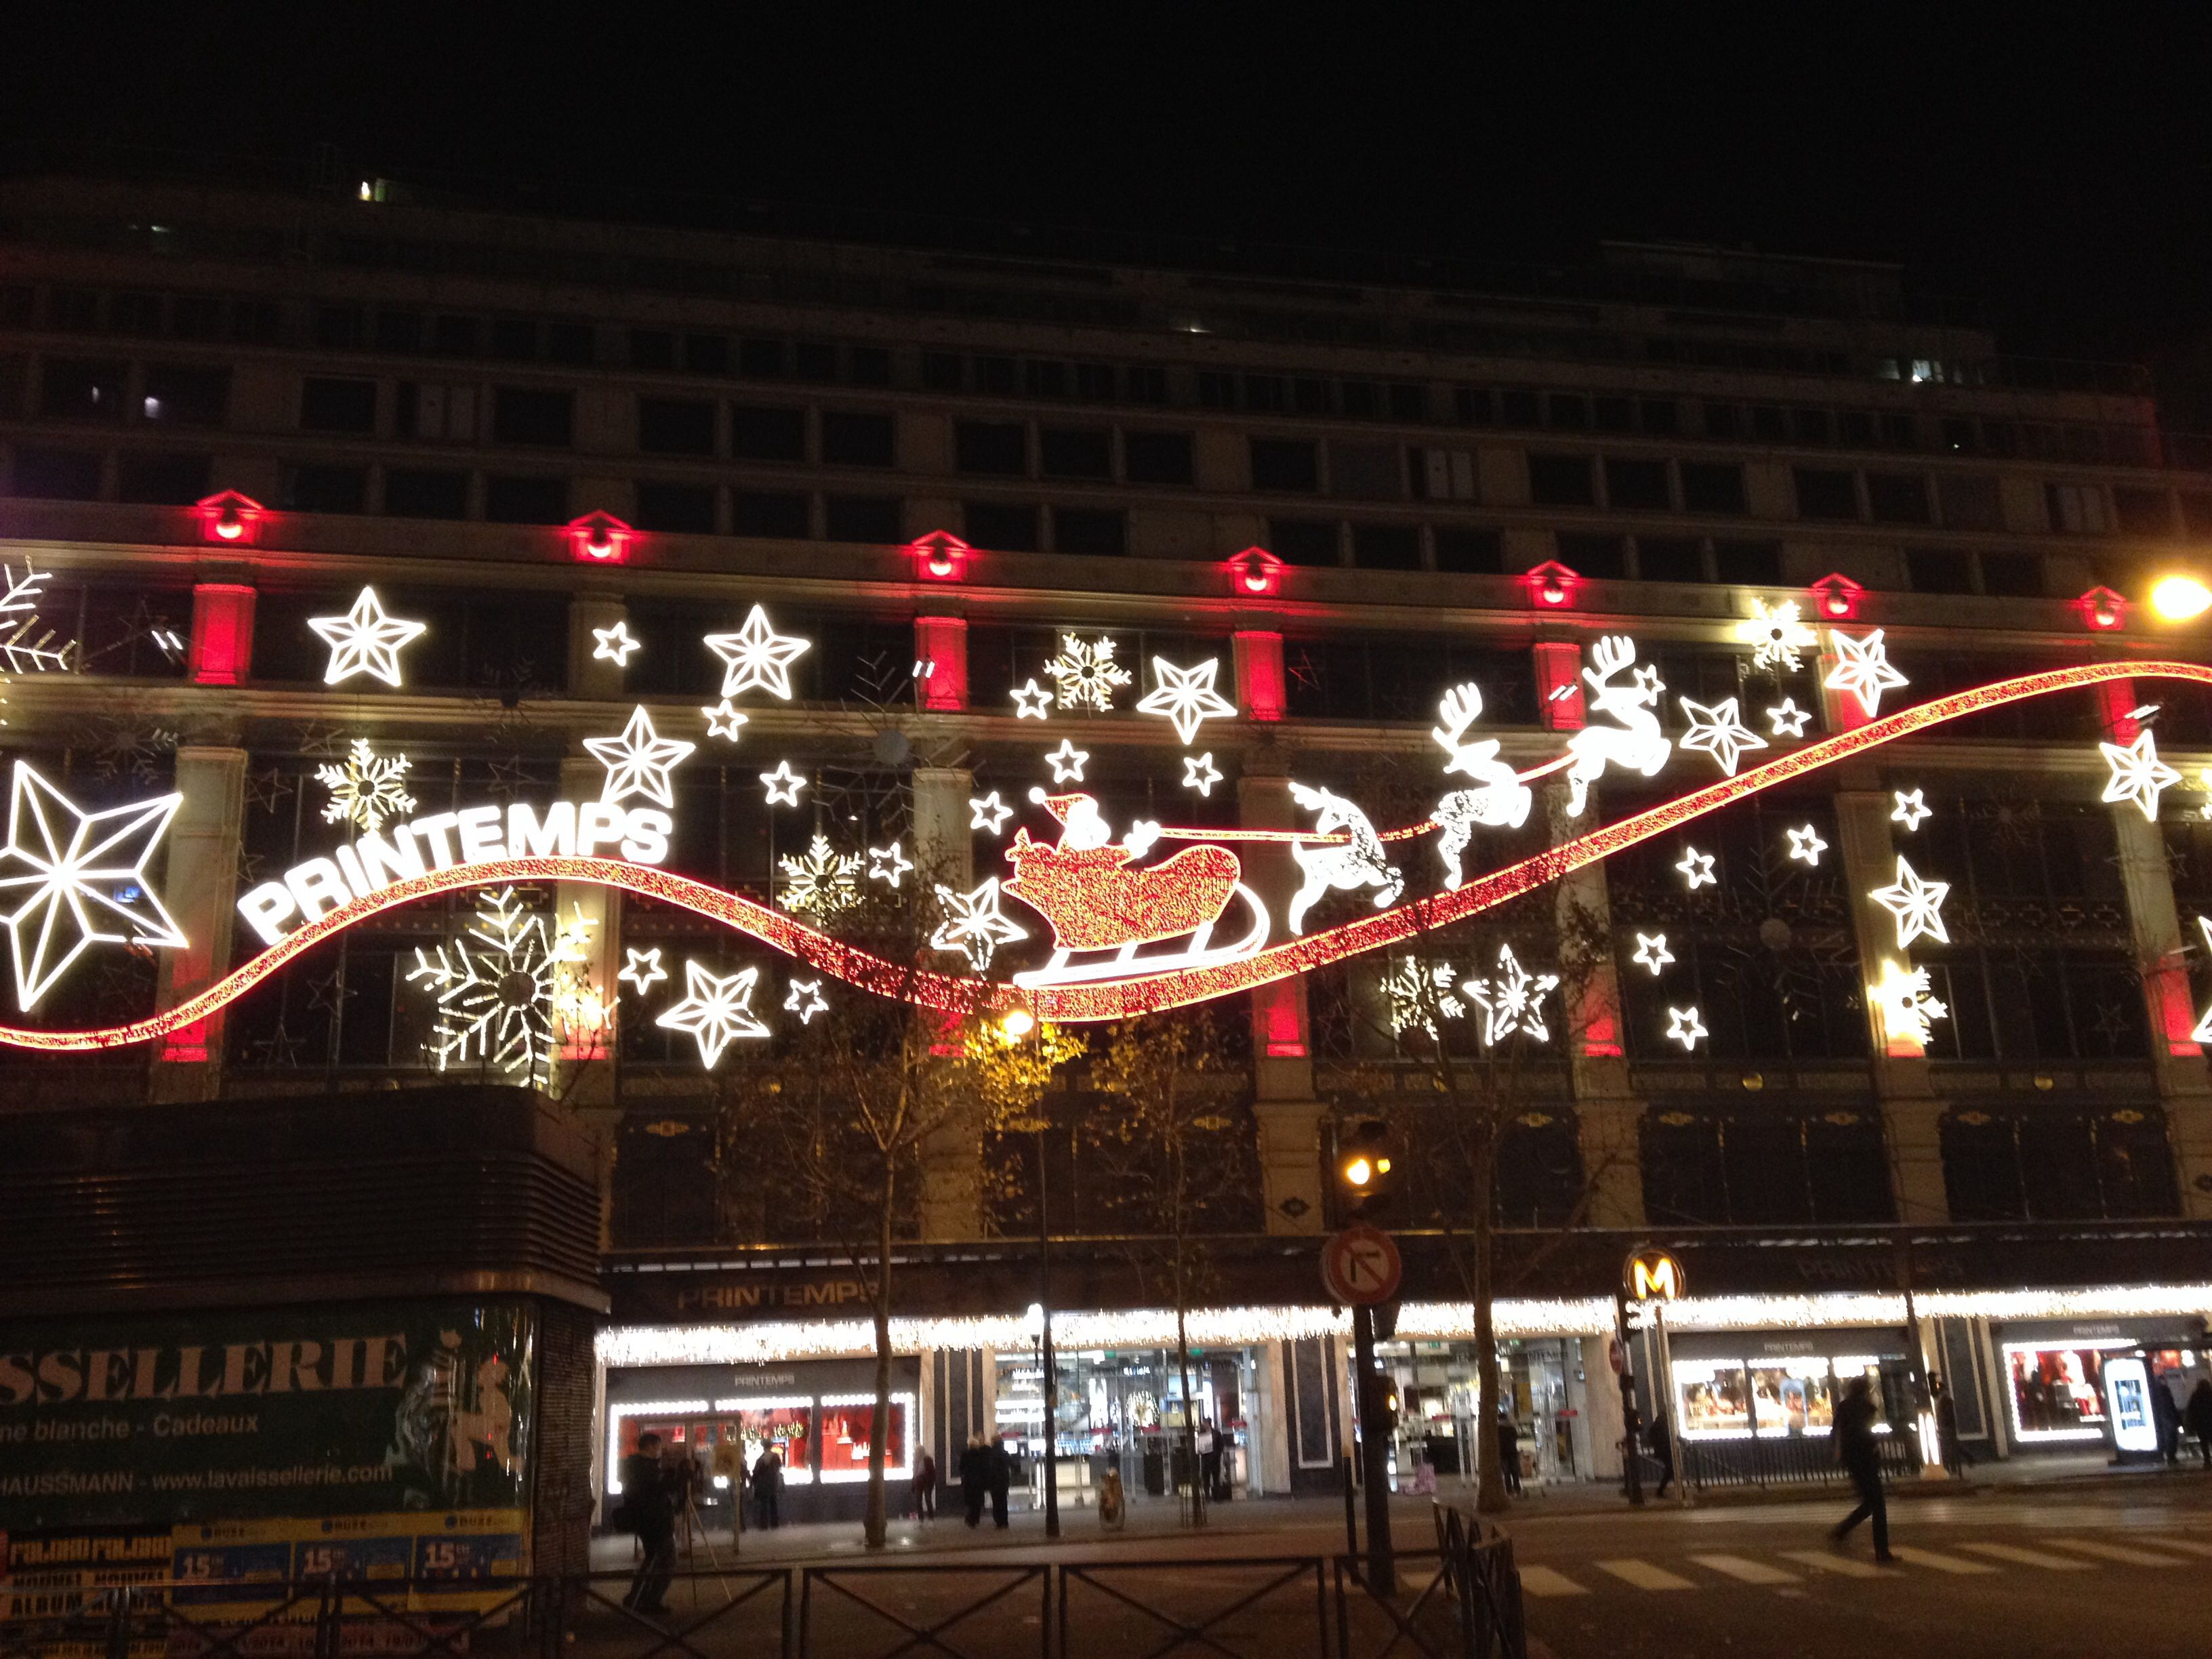 Lumières. Havre Haussmann 2013